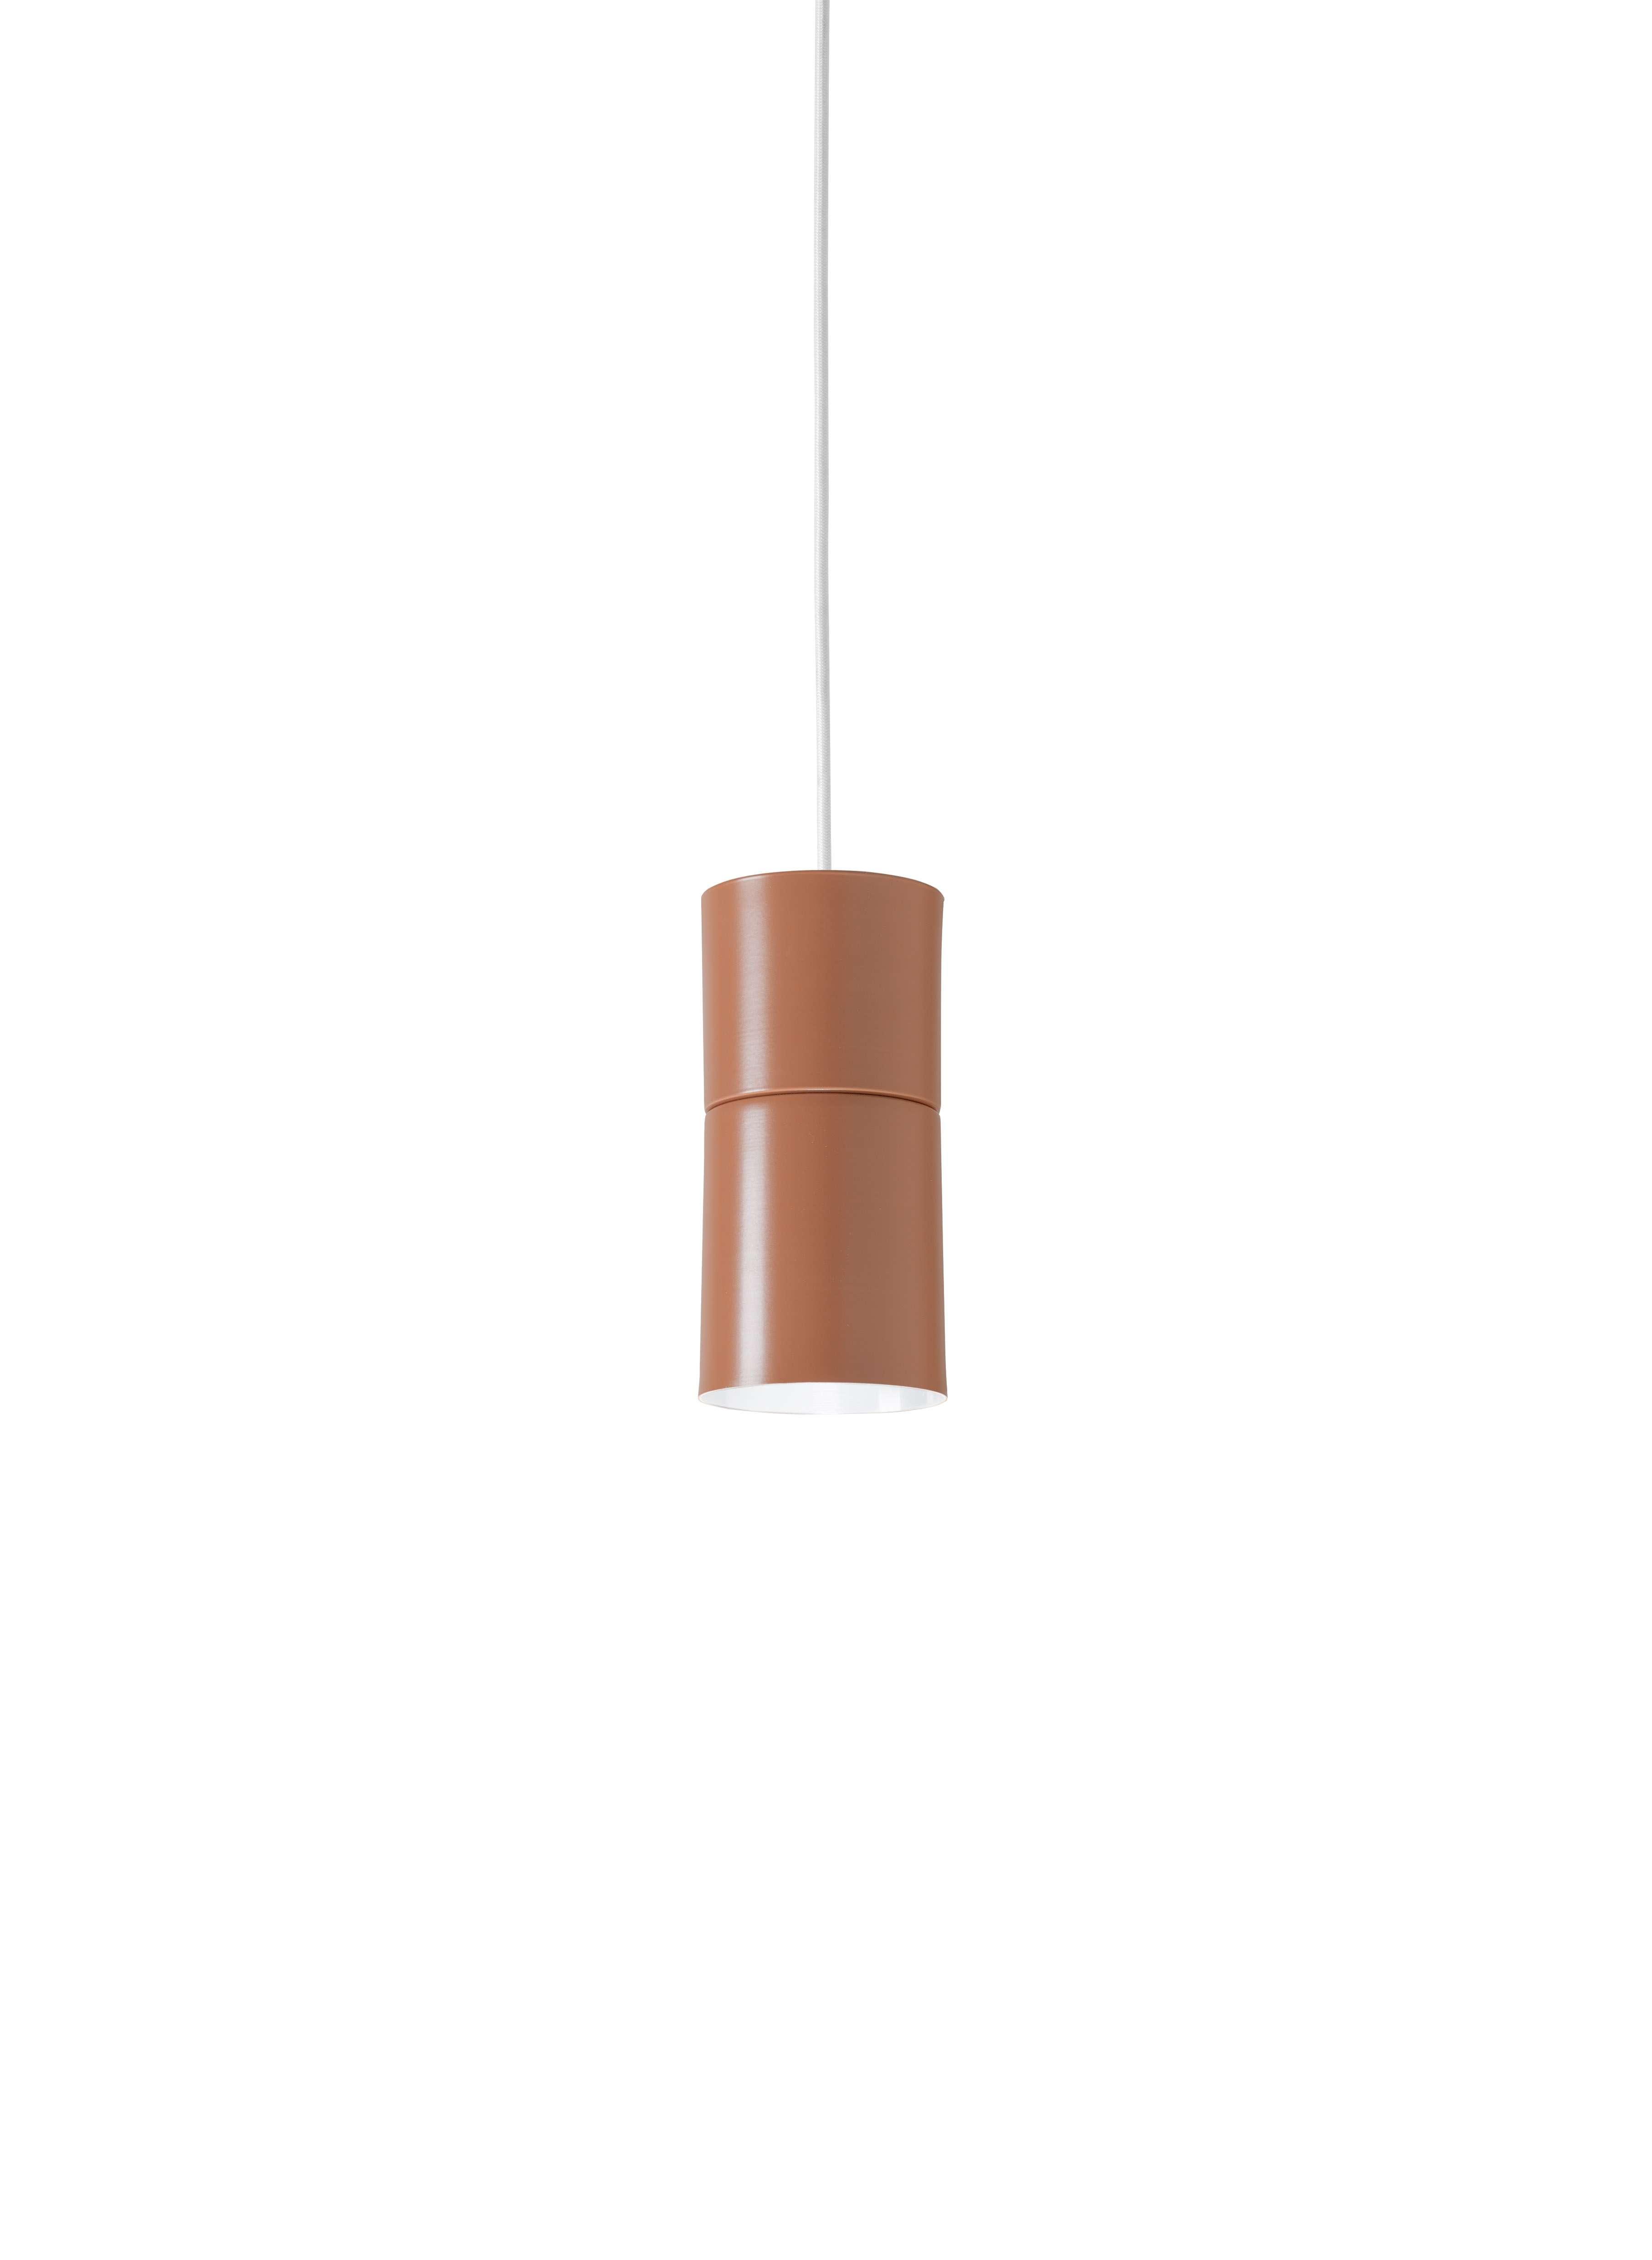 Loxone, SmartHome, iluminación, LED, Sentry